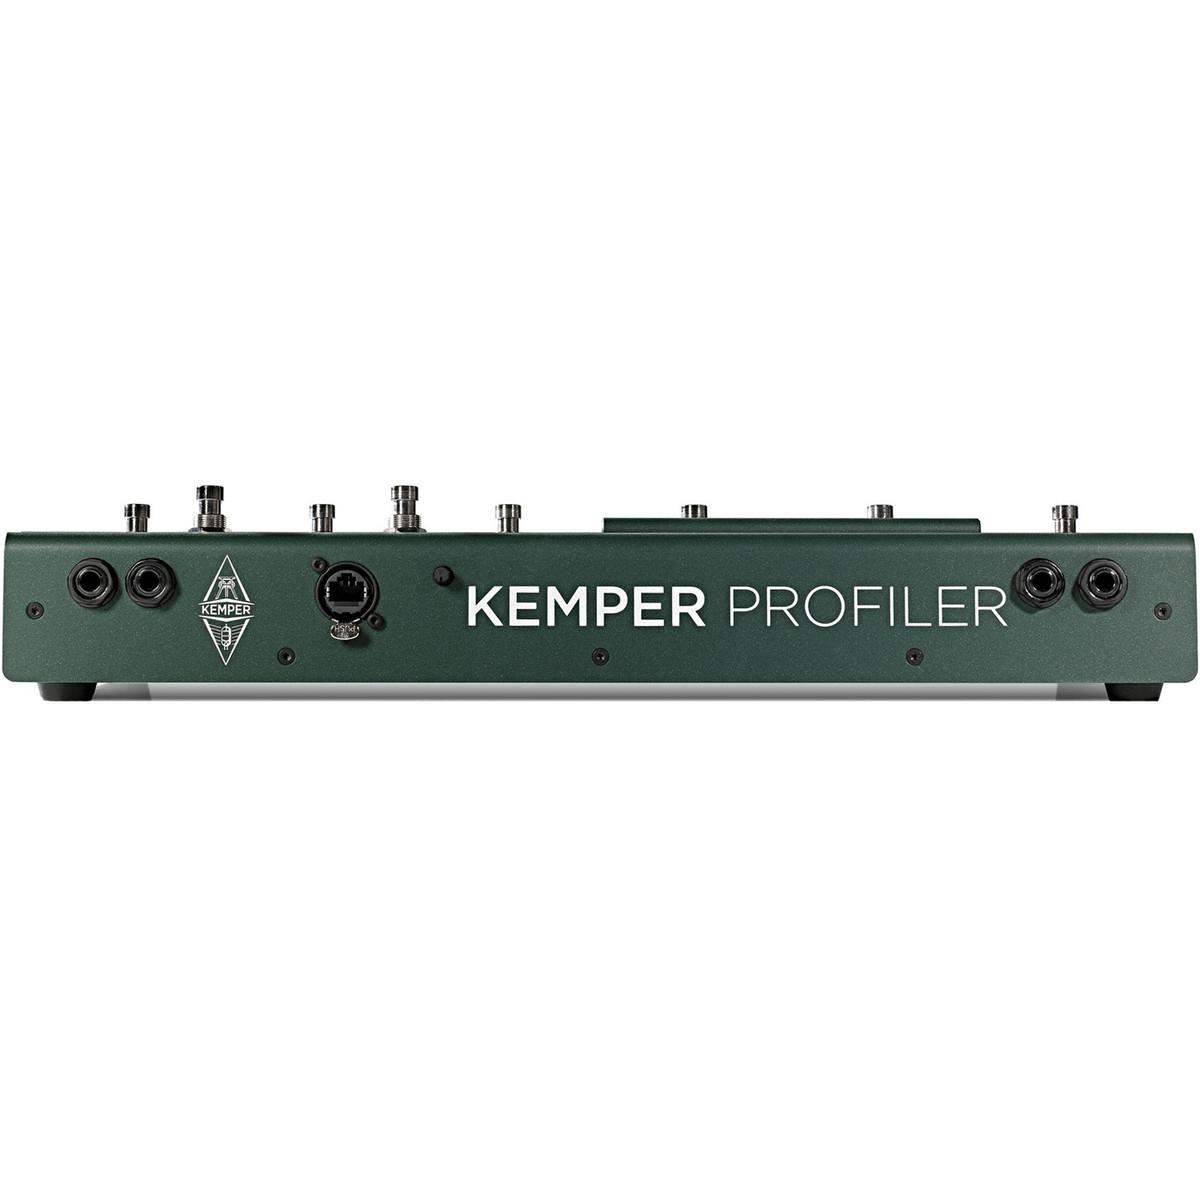 kemper-profiler-head-verde-scuro-controller-profiler-remote-control-offerta-in-bundle-3